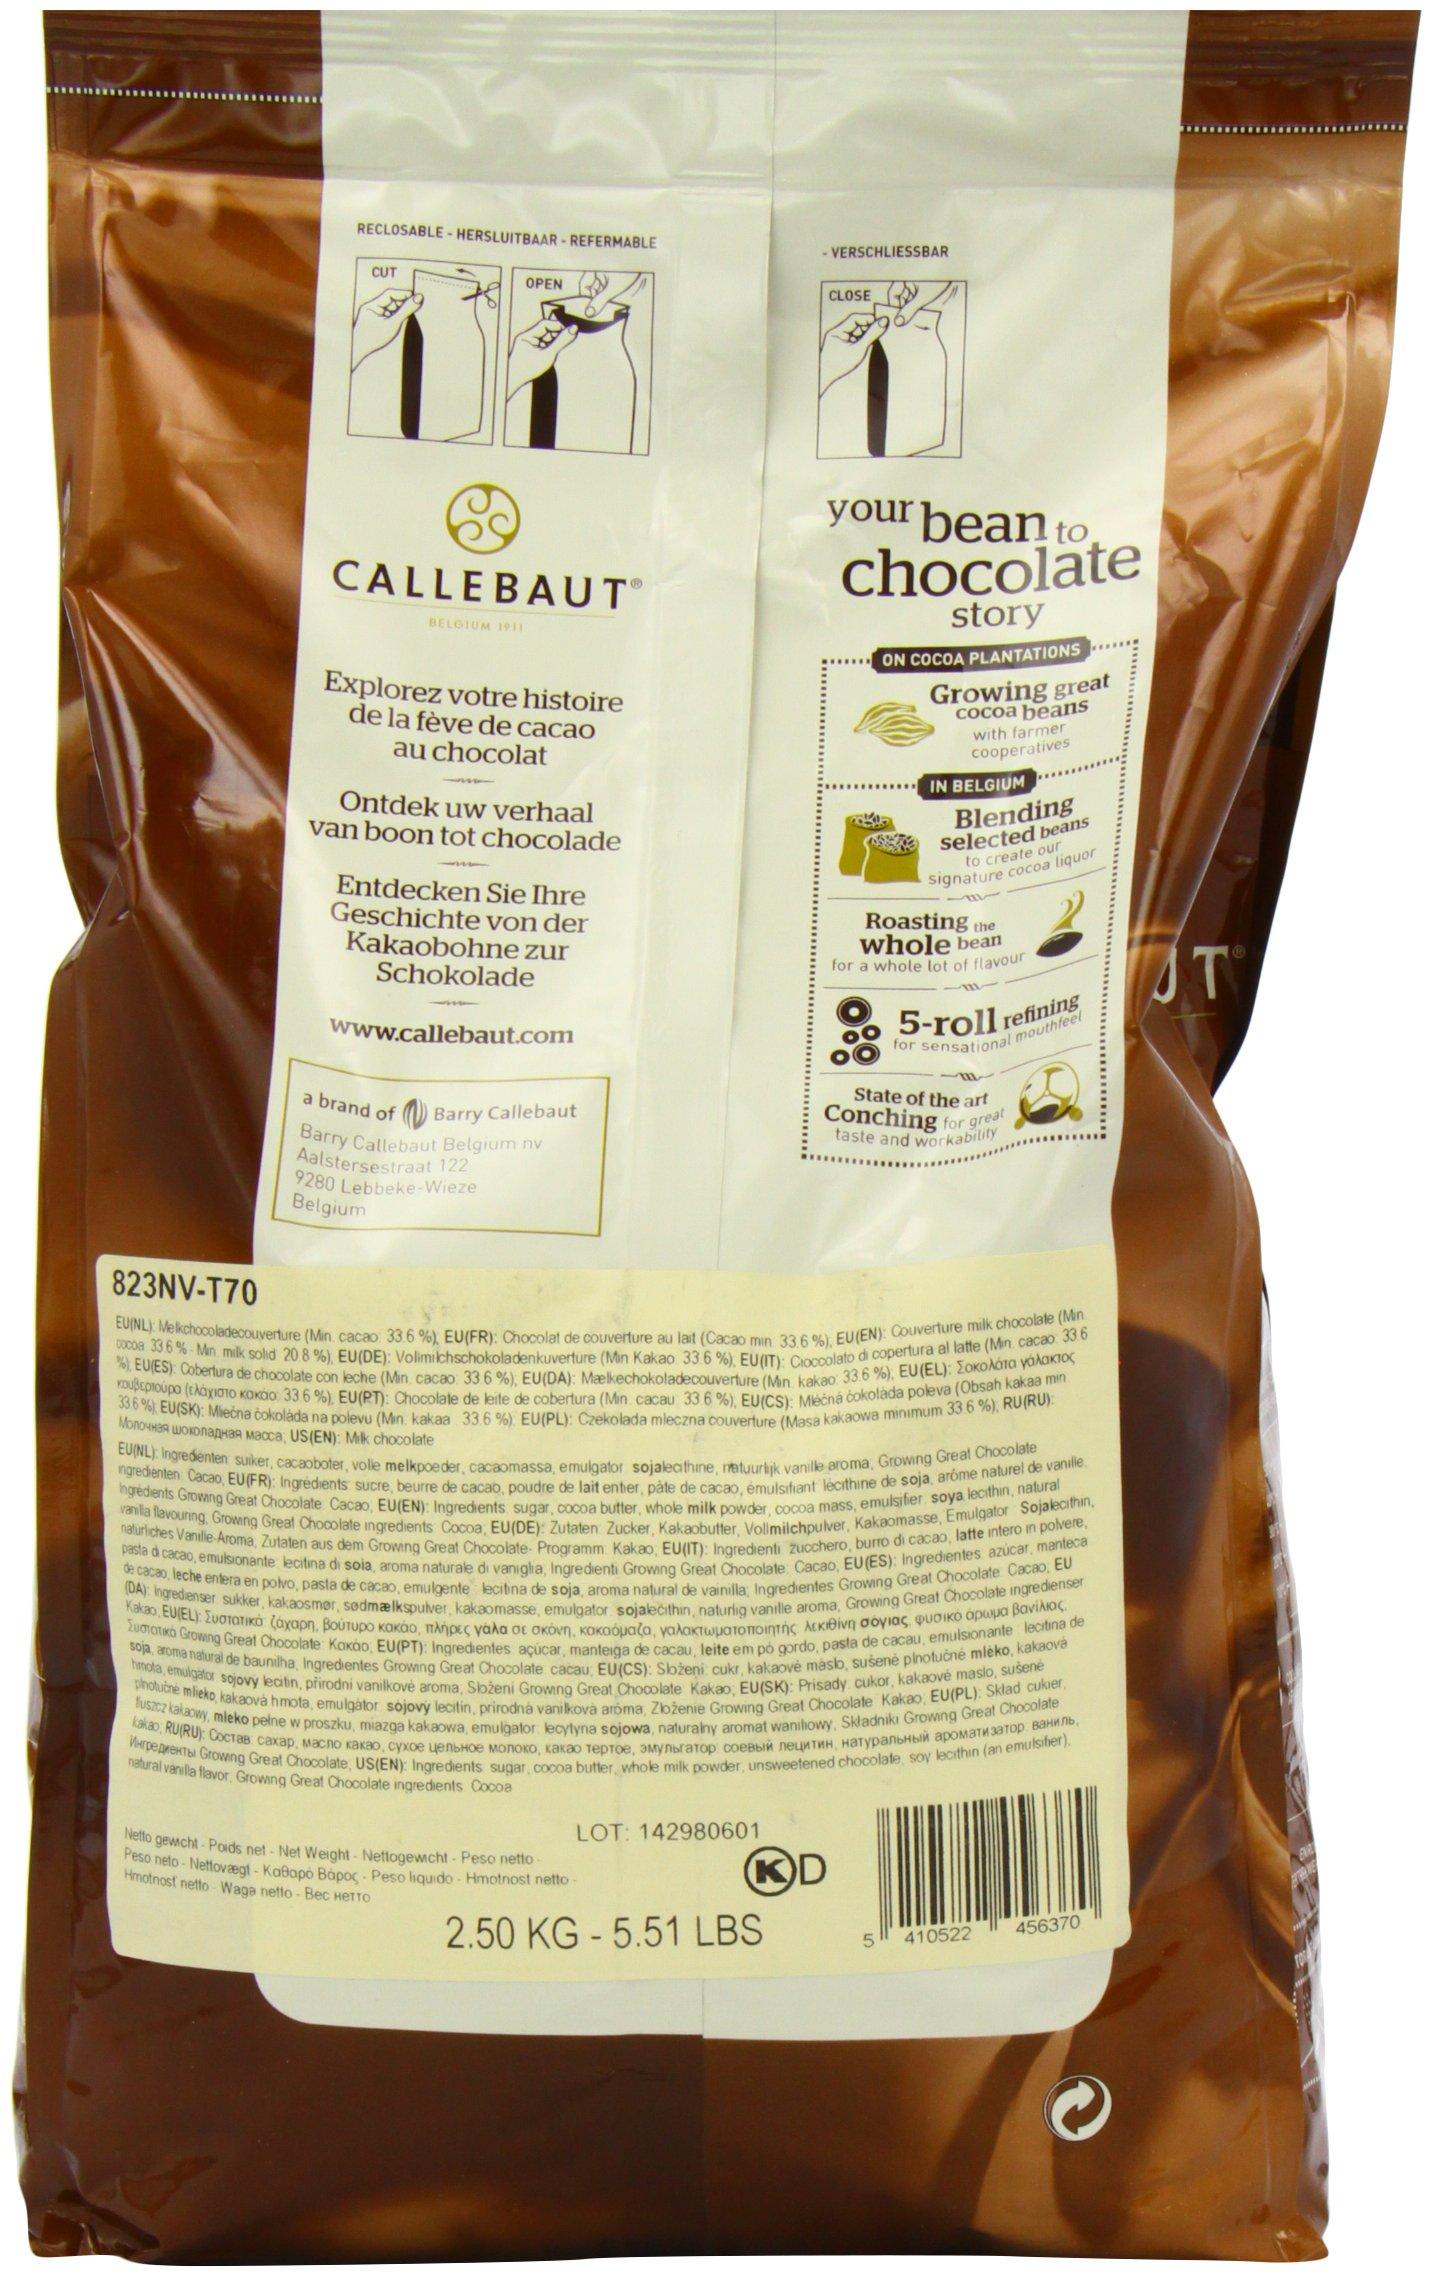 Belgian Milk Chocolate Baking Callets (Chips) - 33.6% - 1 bag, 5.5 lbs by Callebaut (Image #5)